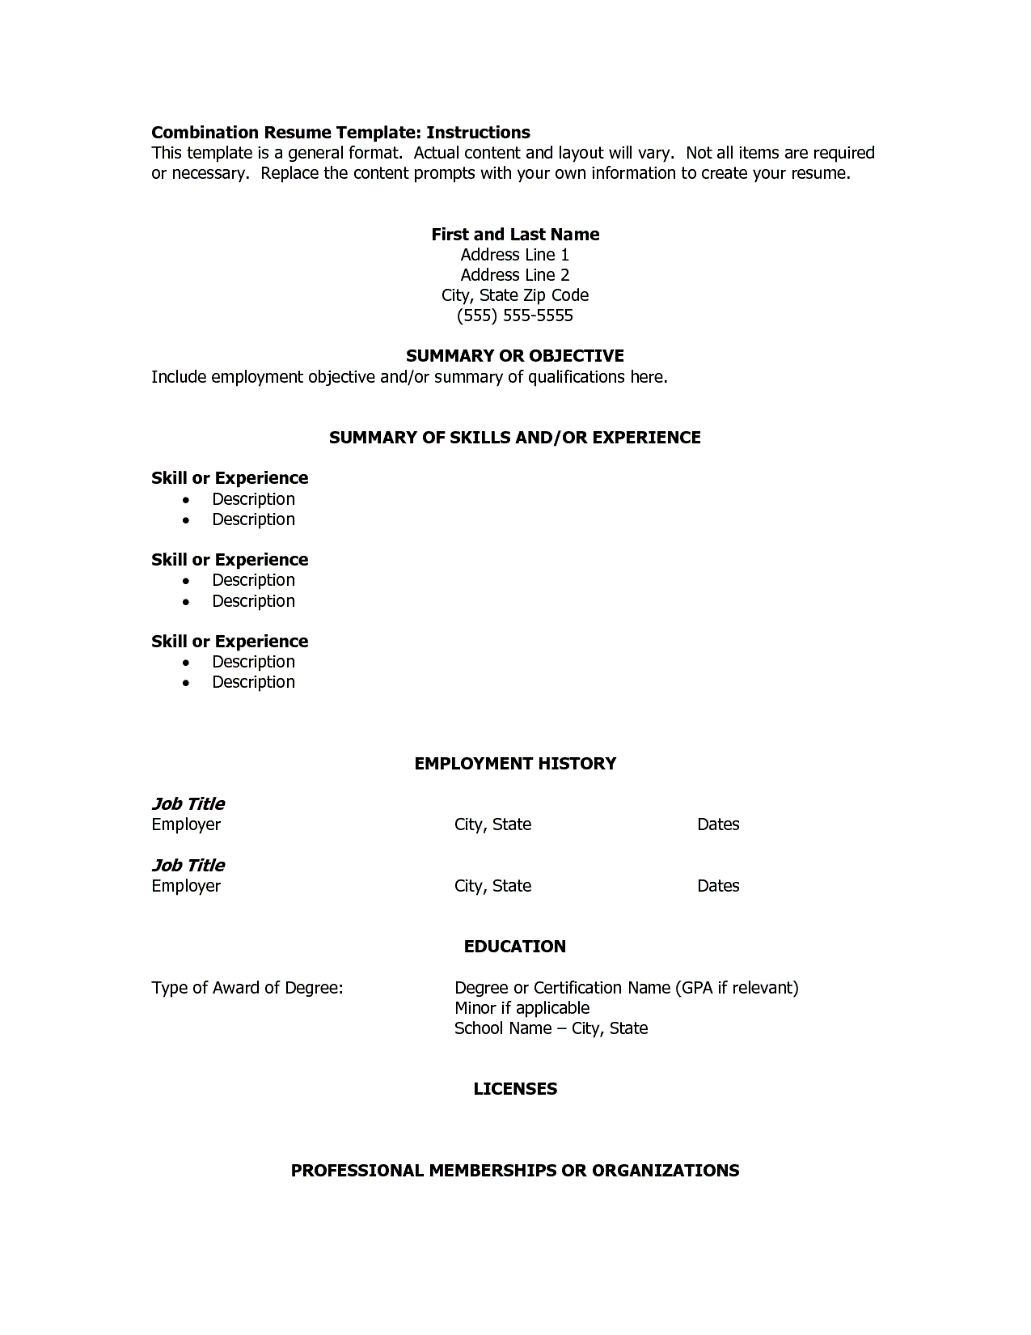 Resume Format Dates